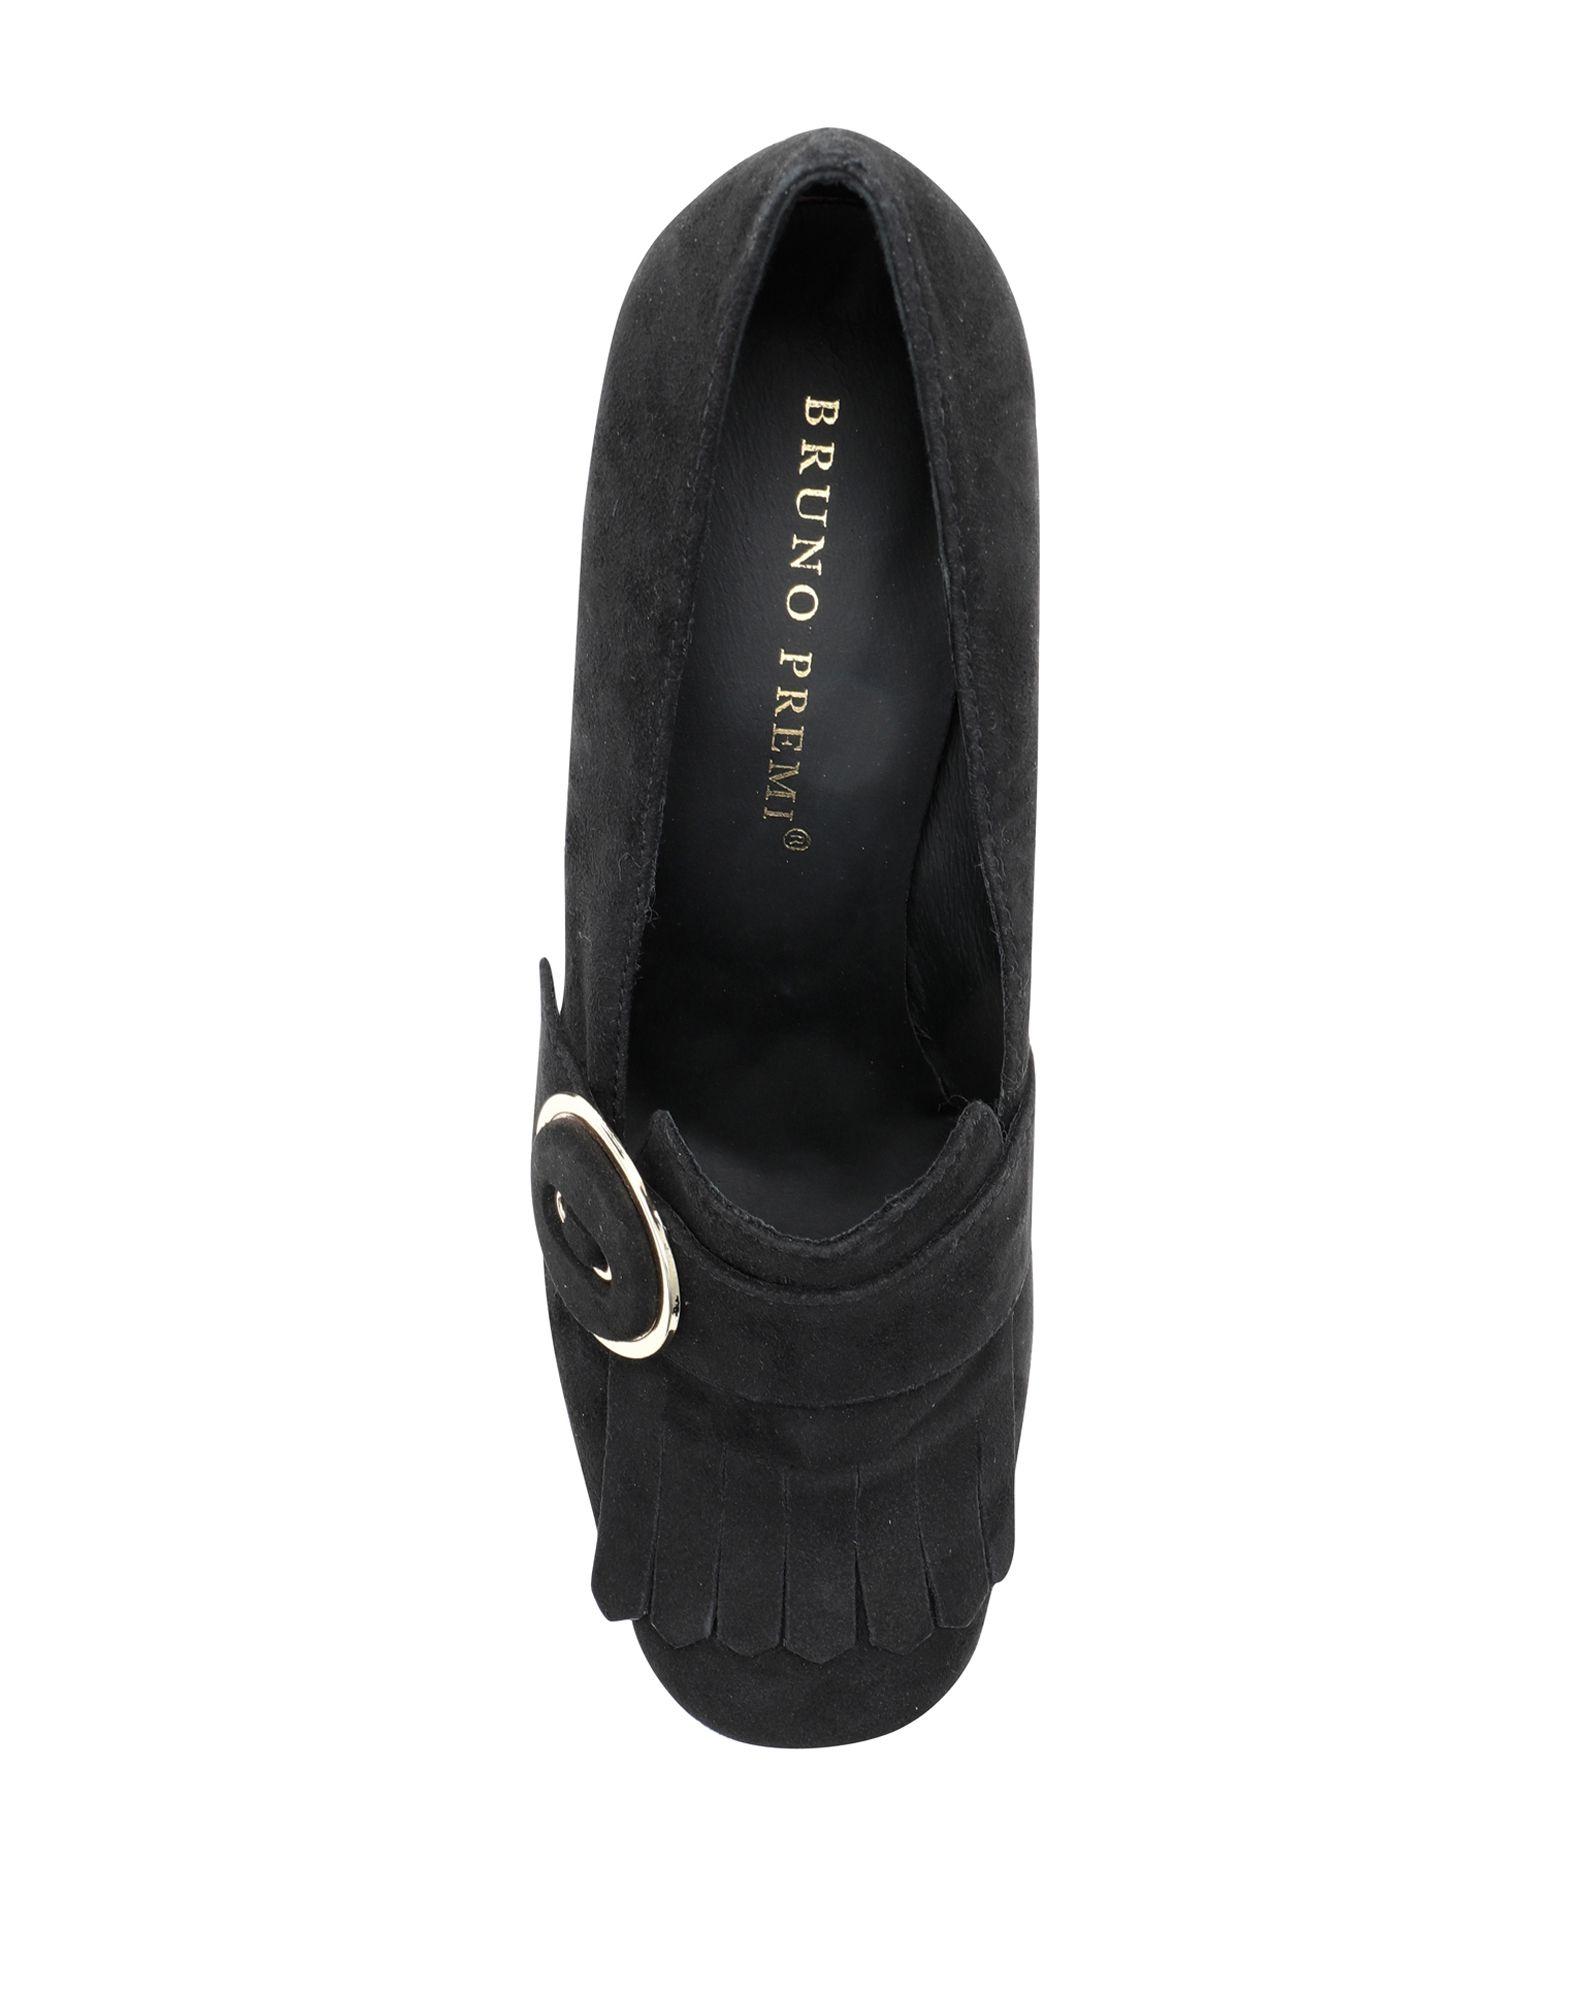 Gut um billige Schuhe zu  tragenBruno Premi Mokassins Damen  zu 11538739UB 8336ae